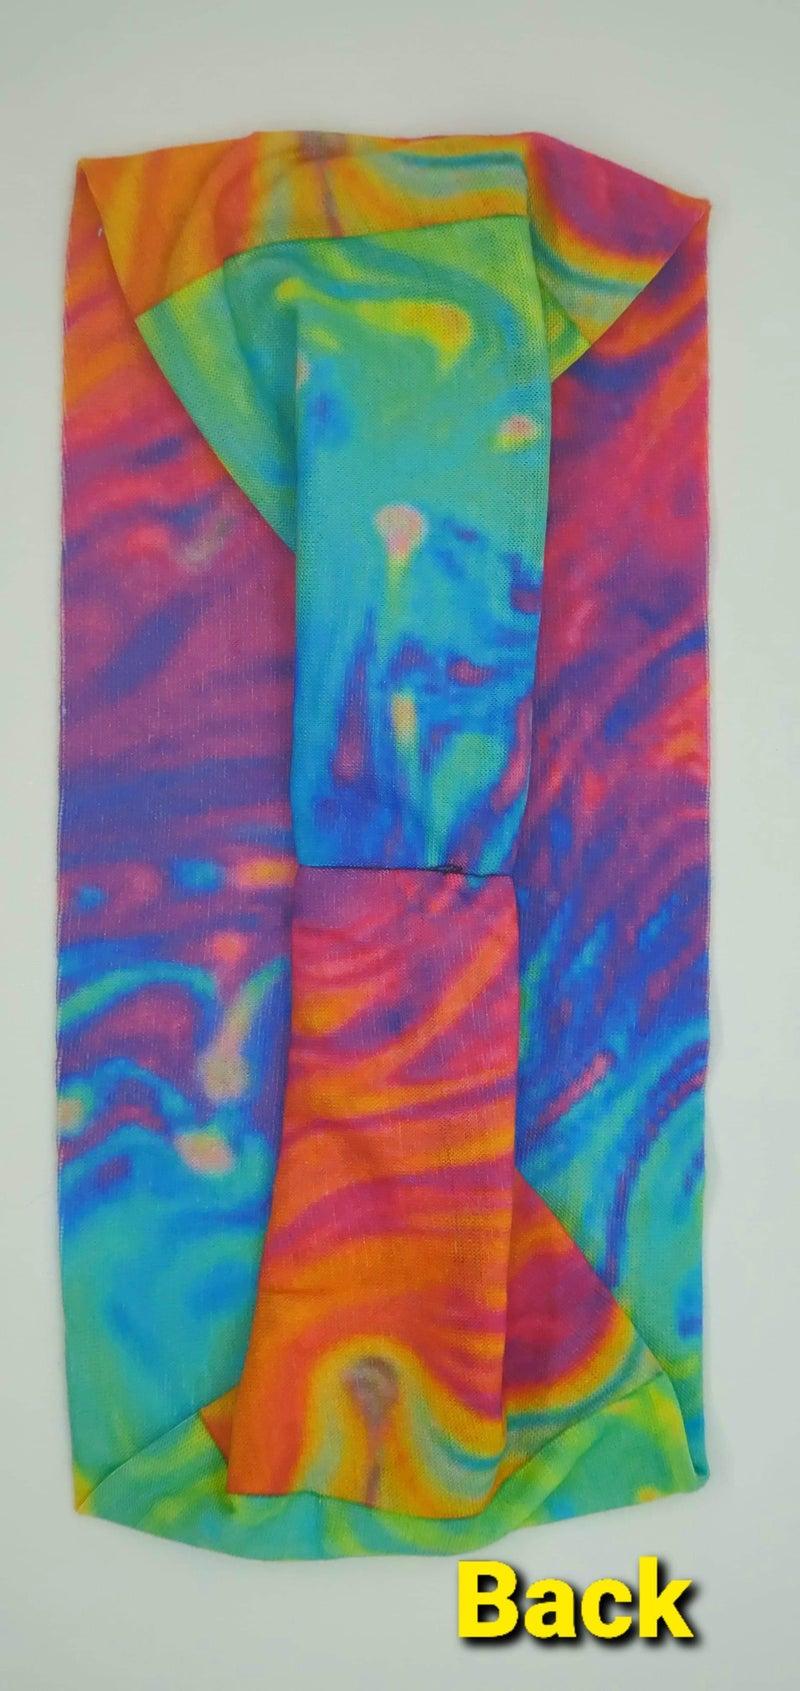 Stretchy Headband Bright Oil Slick Tie Dye with Aurora Borealis crystals (sku5039)